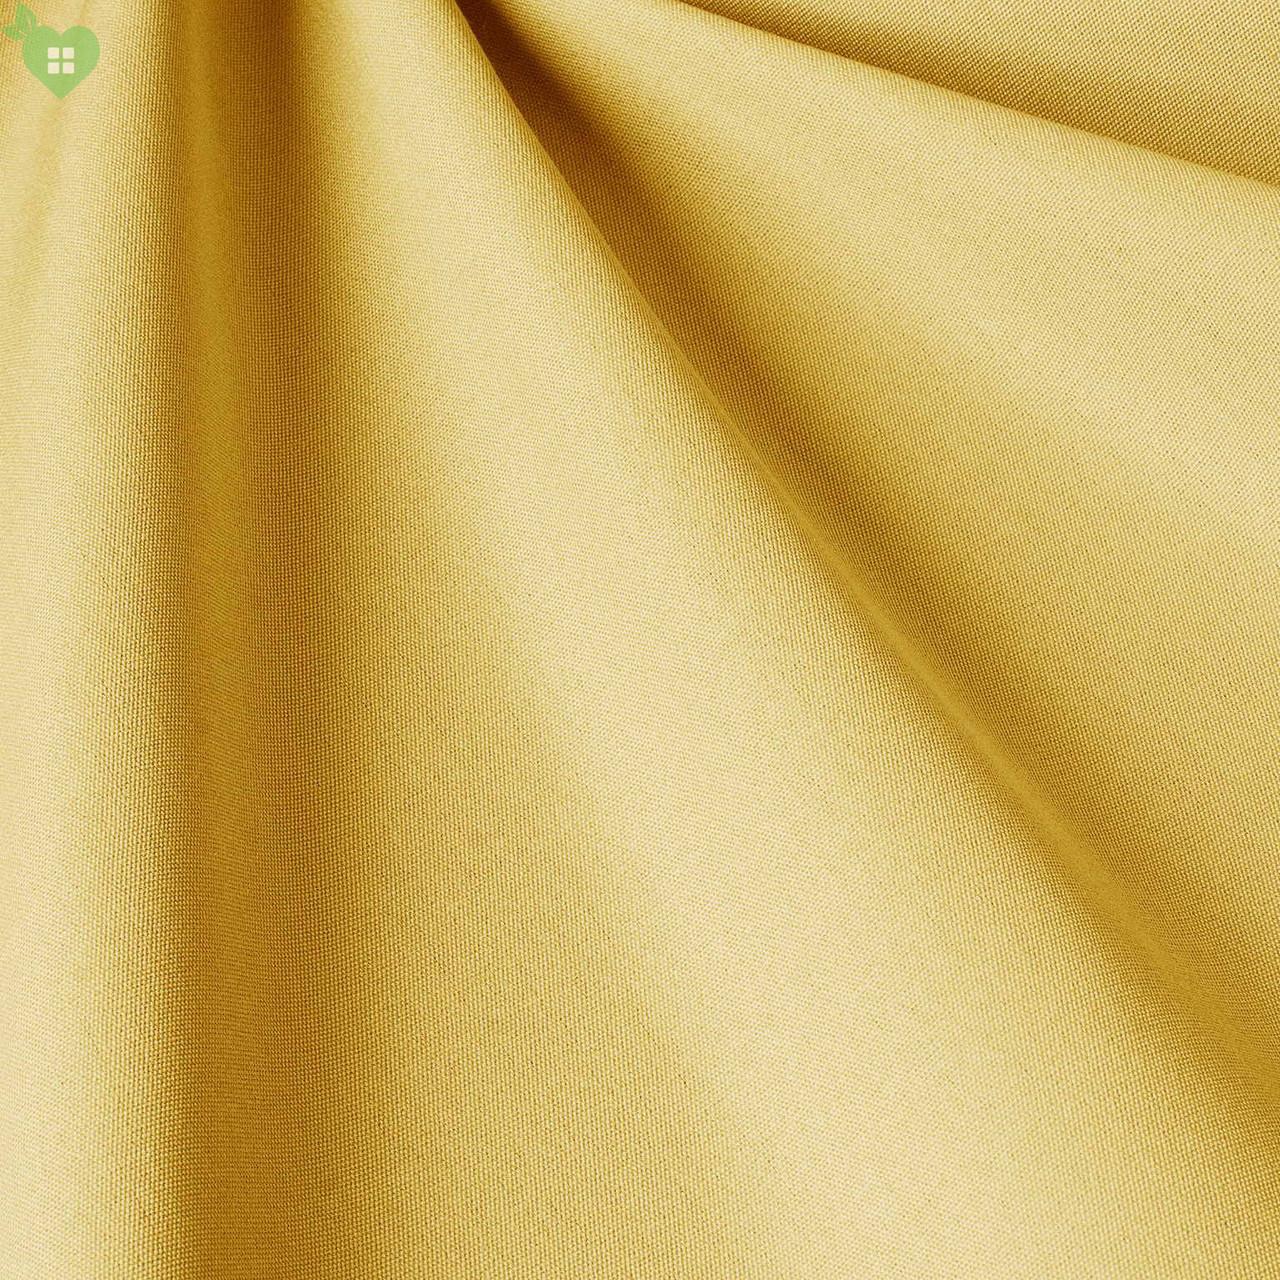 Ткань для улицы: Дралон (Outdoor) 83380v8